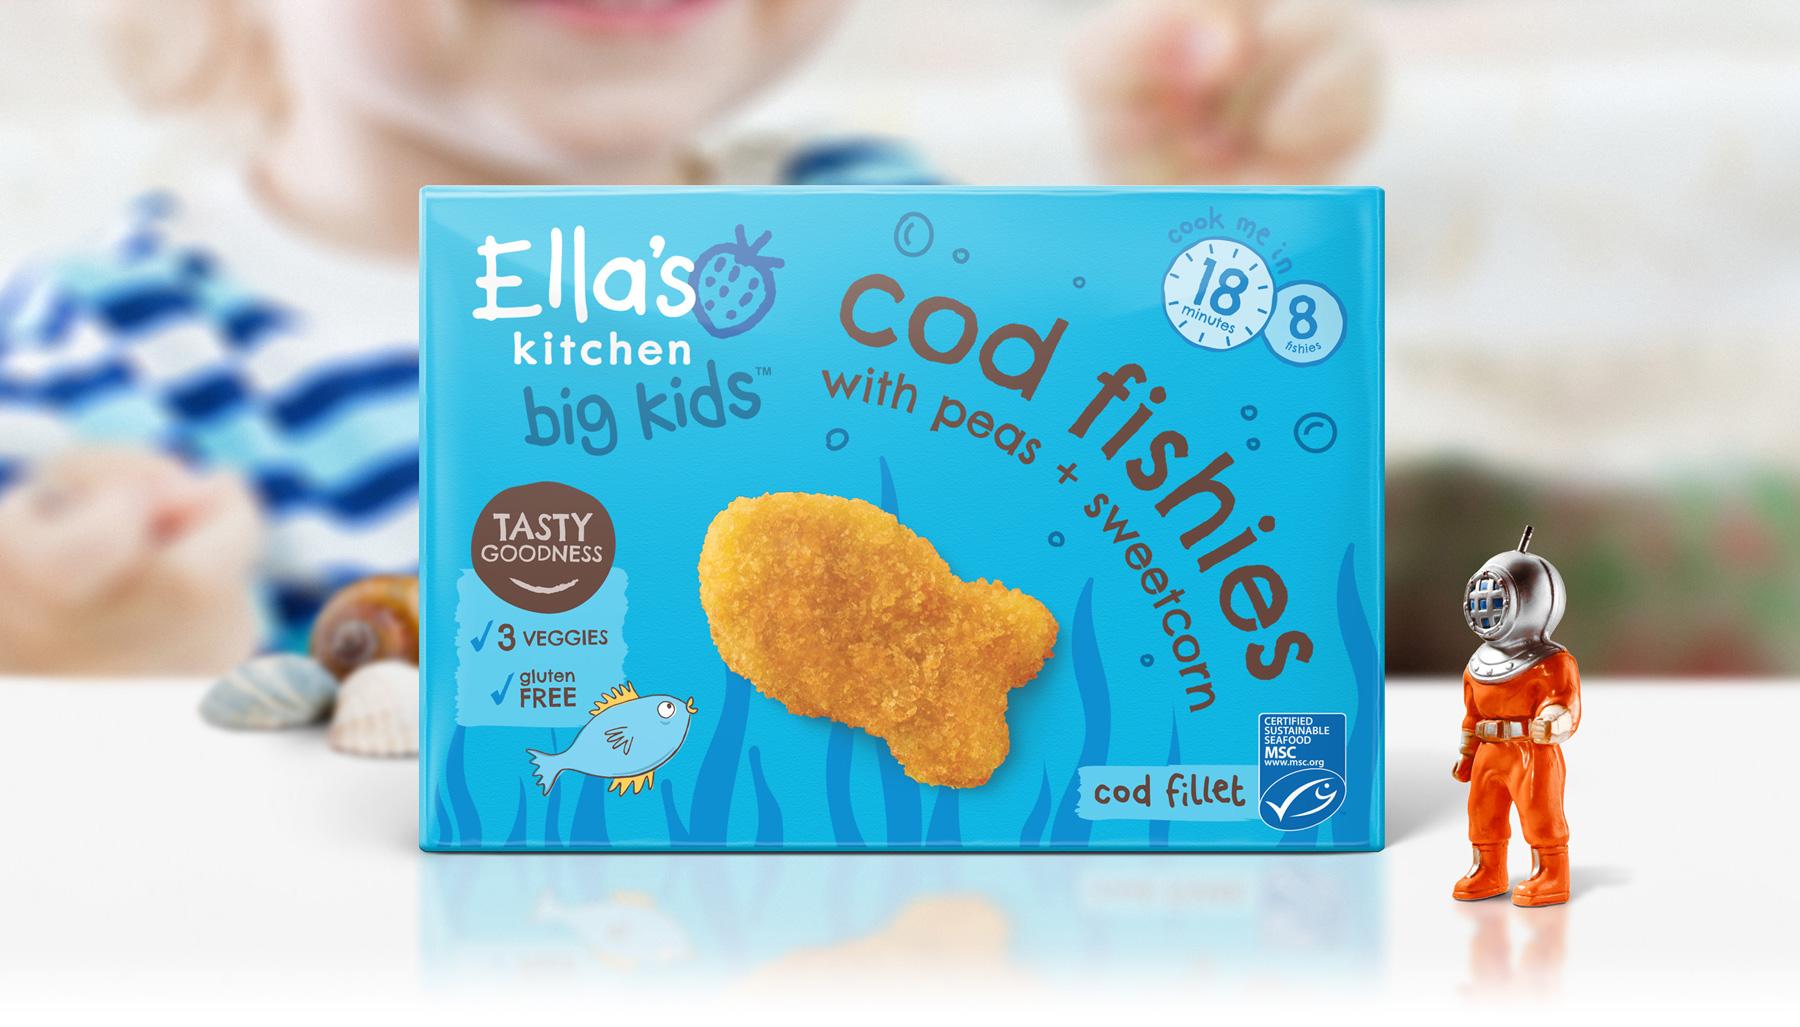 Ella's Kitchen Brand identity big kitchen pack shot designed by Biles Hendry